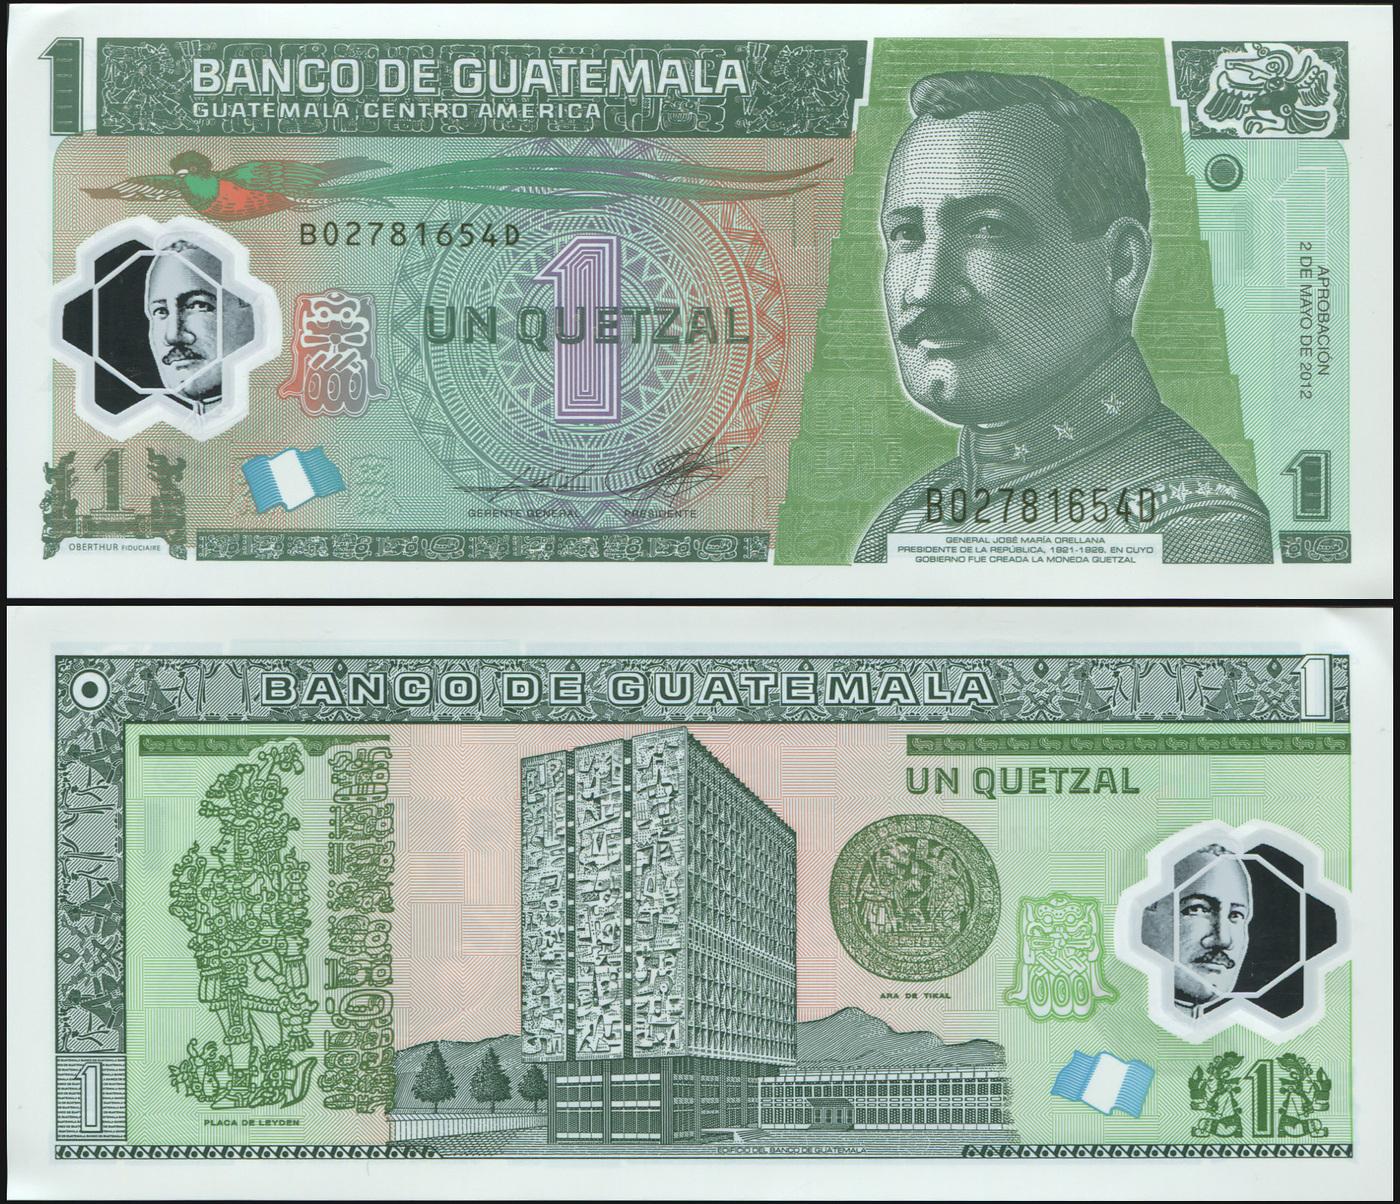 Банкнота. Гватемала 1 кетцаль. 02.05.2012 Пластик UNC. Кат.P.115b купюра 5 кетцаль гватемала 2008 год